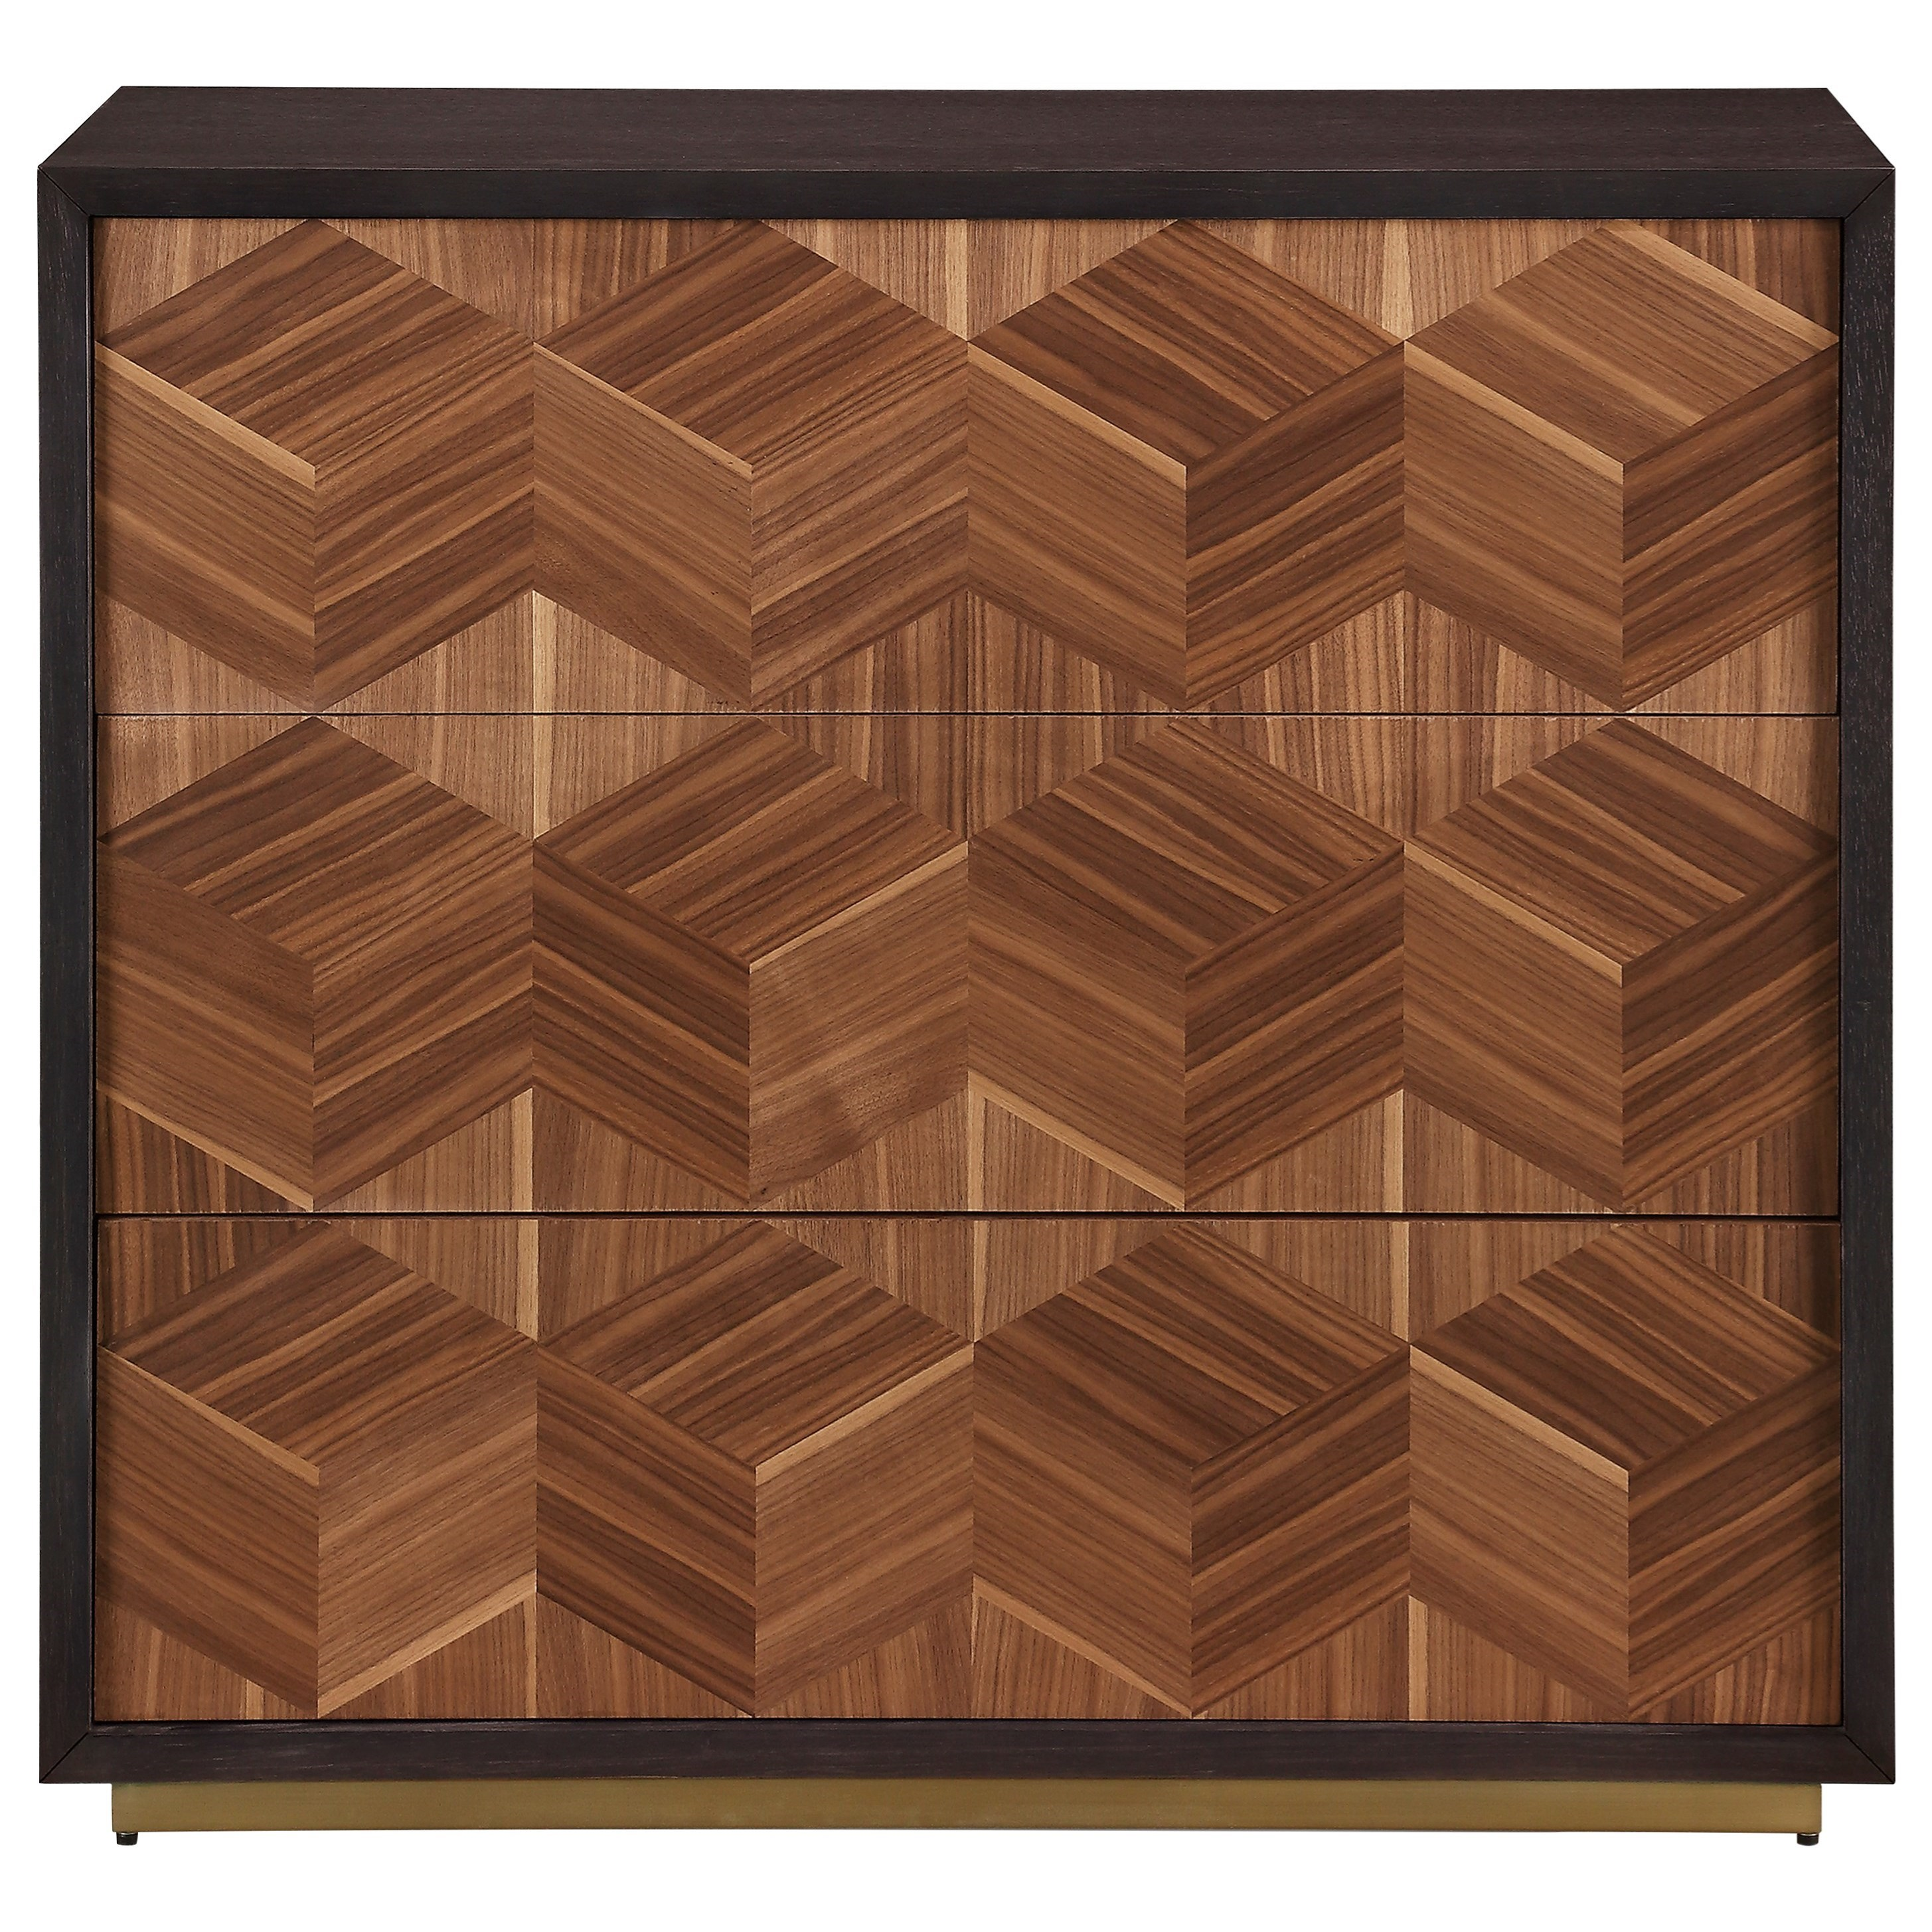 Bobby Berk Brekke Drawer Chest by A.R.T. Furniture Inc at Stoney Creek Furniture